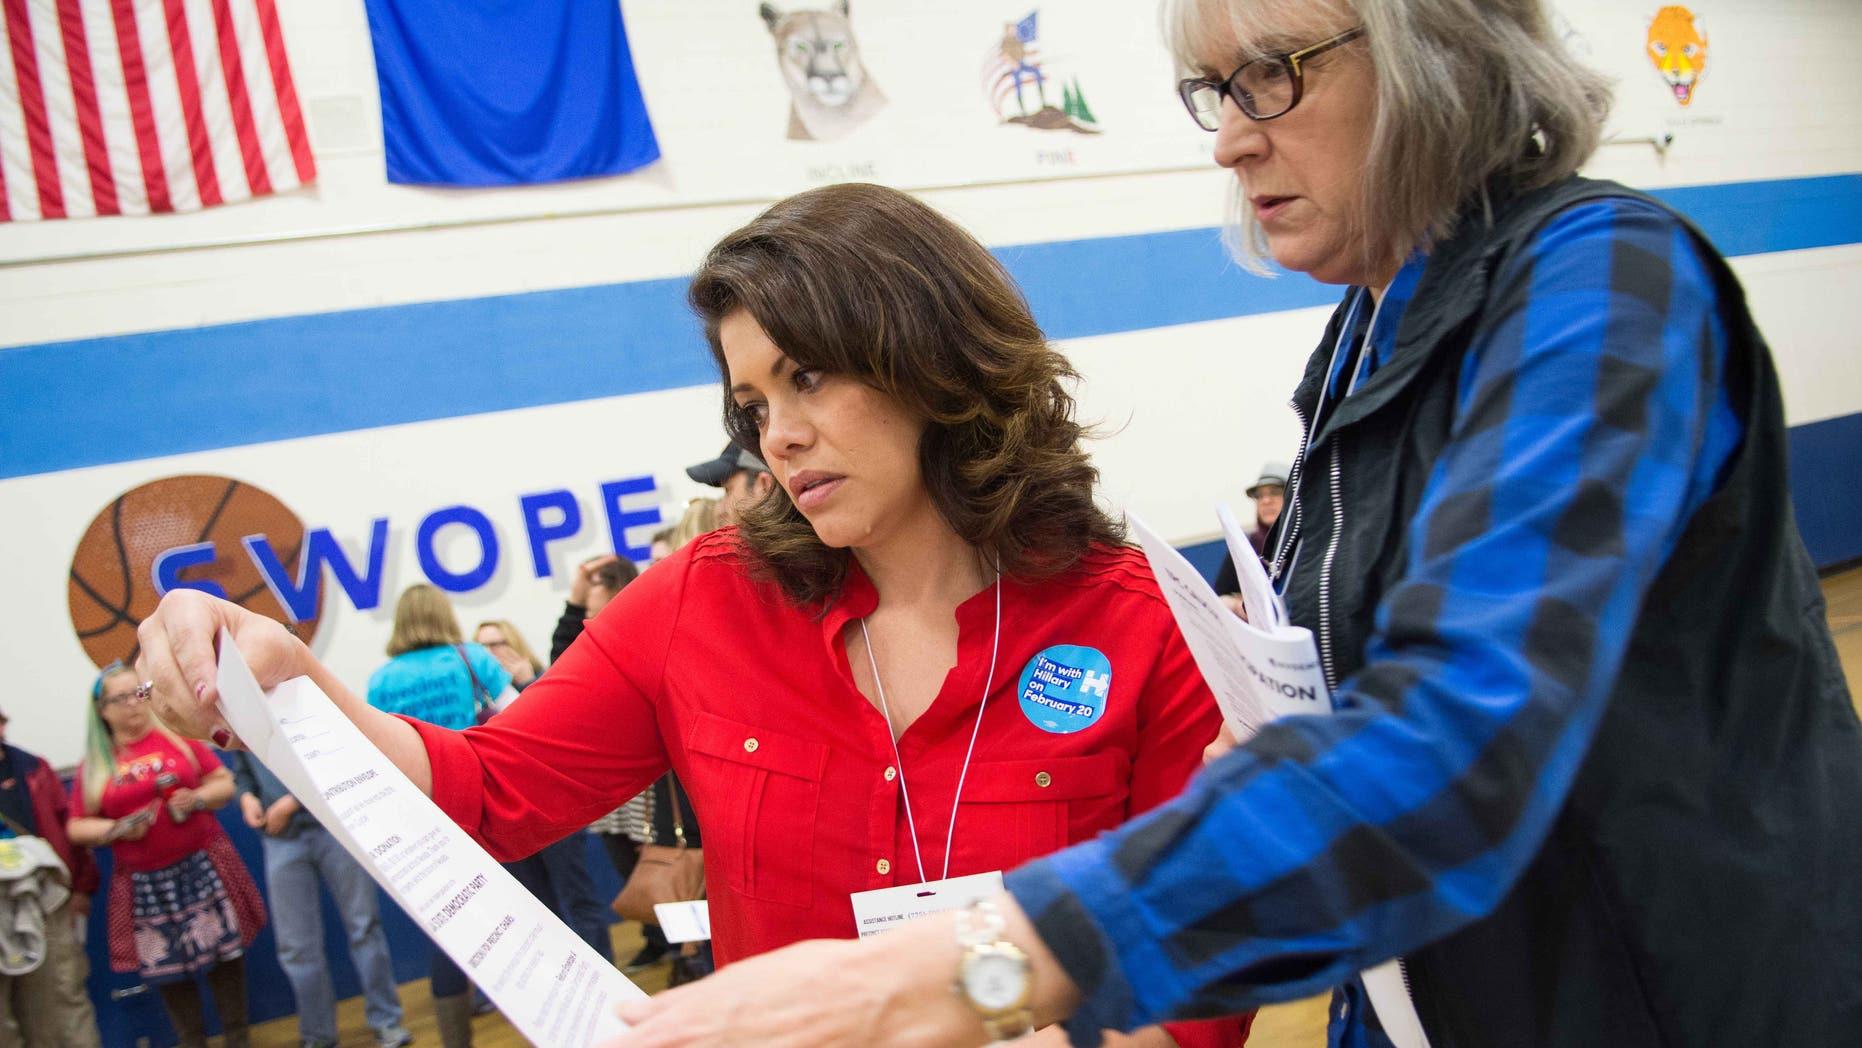 Nevada Assemblywoman Teresa Benitez-Thompson and Martha Hildreth on February 20, 2016 in Reno, Nevada.